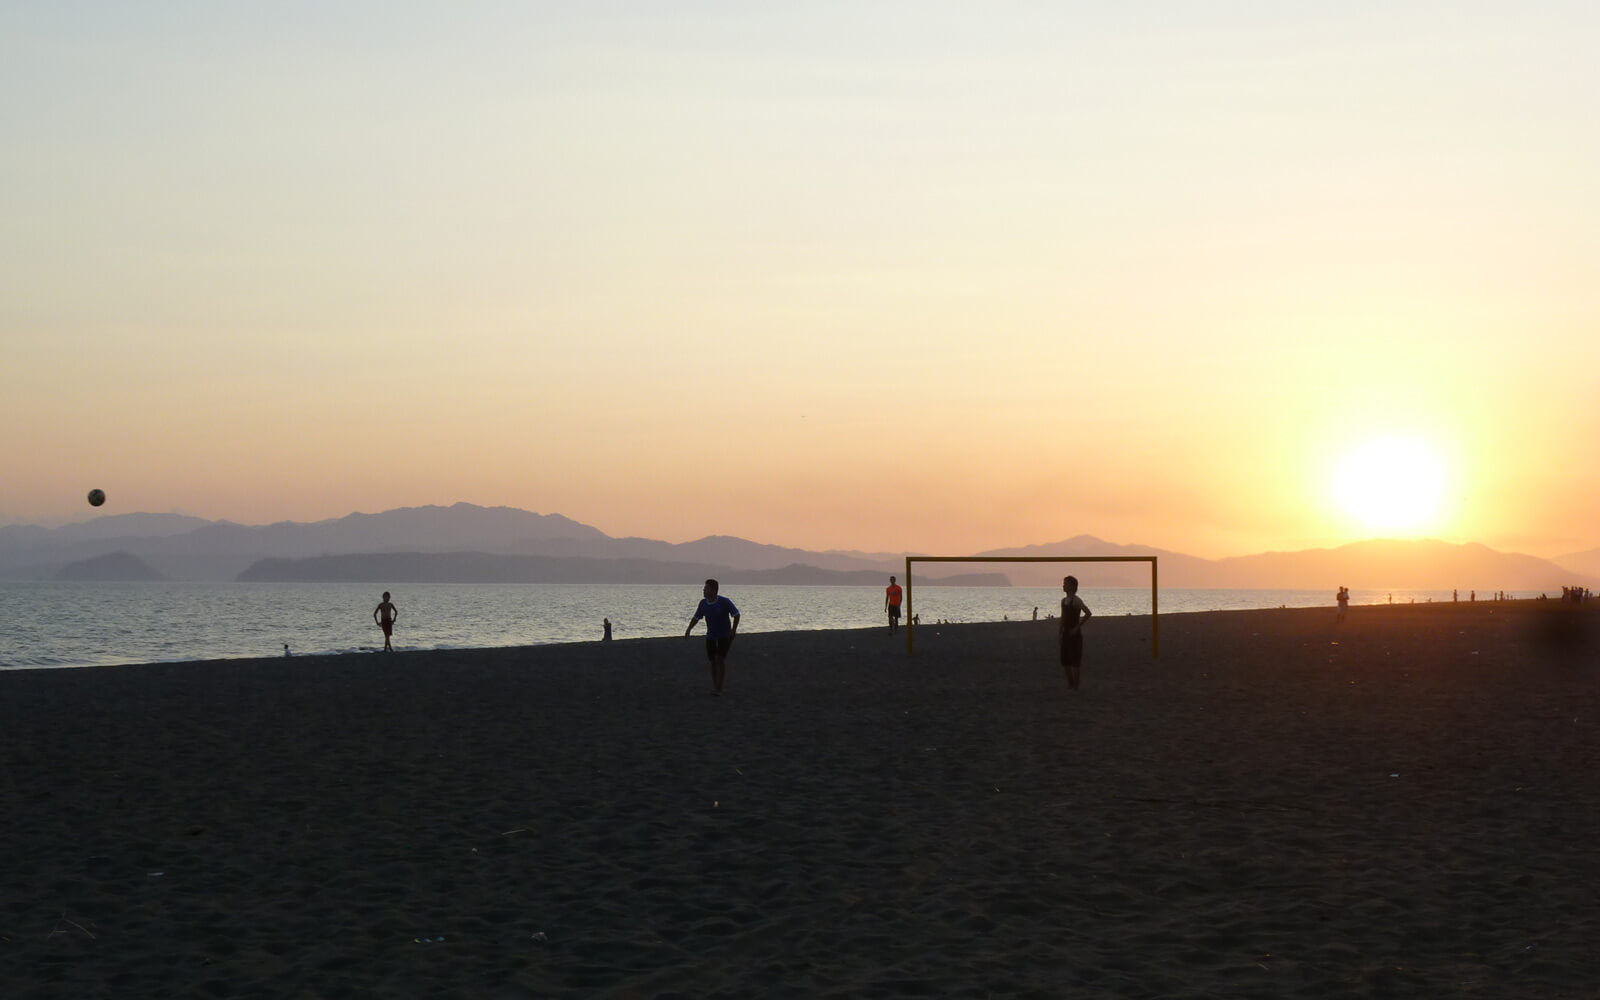 Sonnenuntergang am Strand, Costa Rica